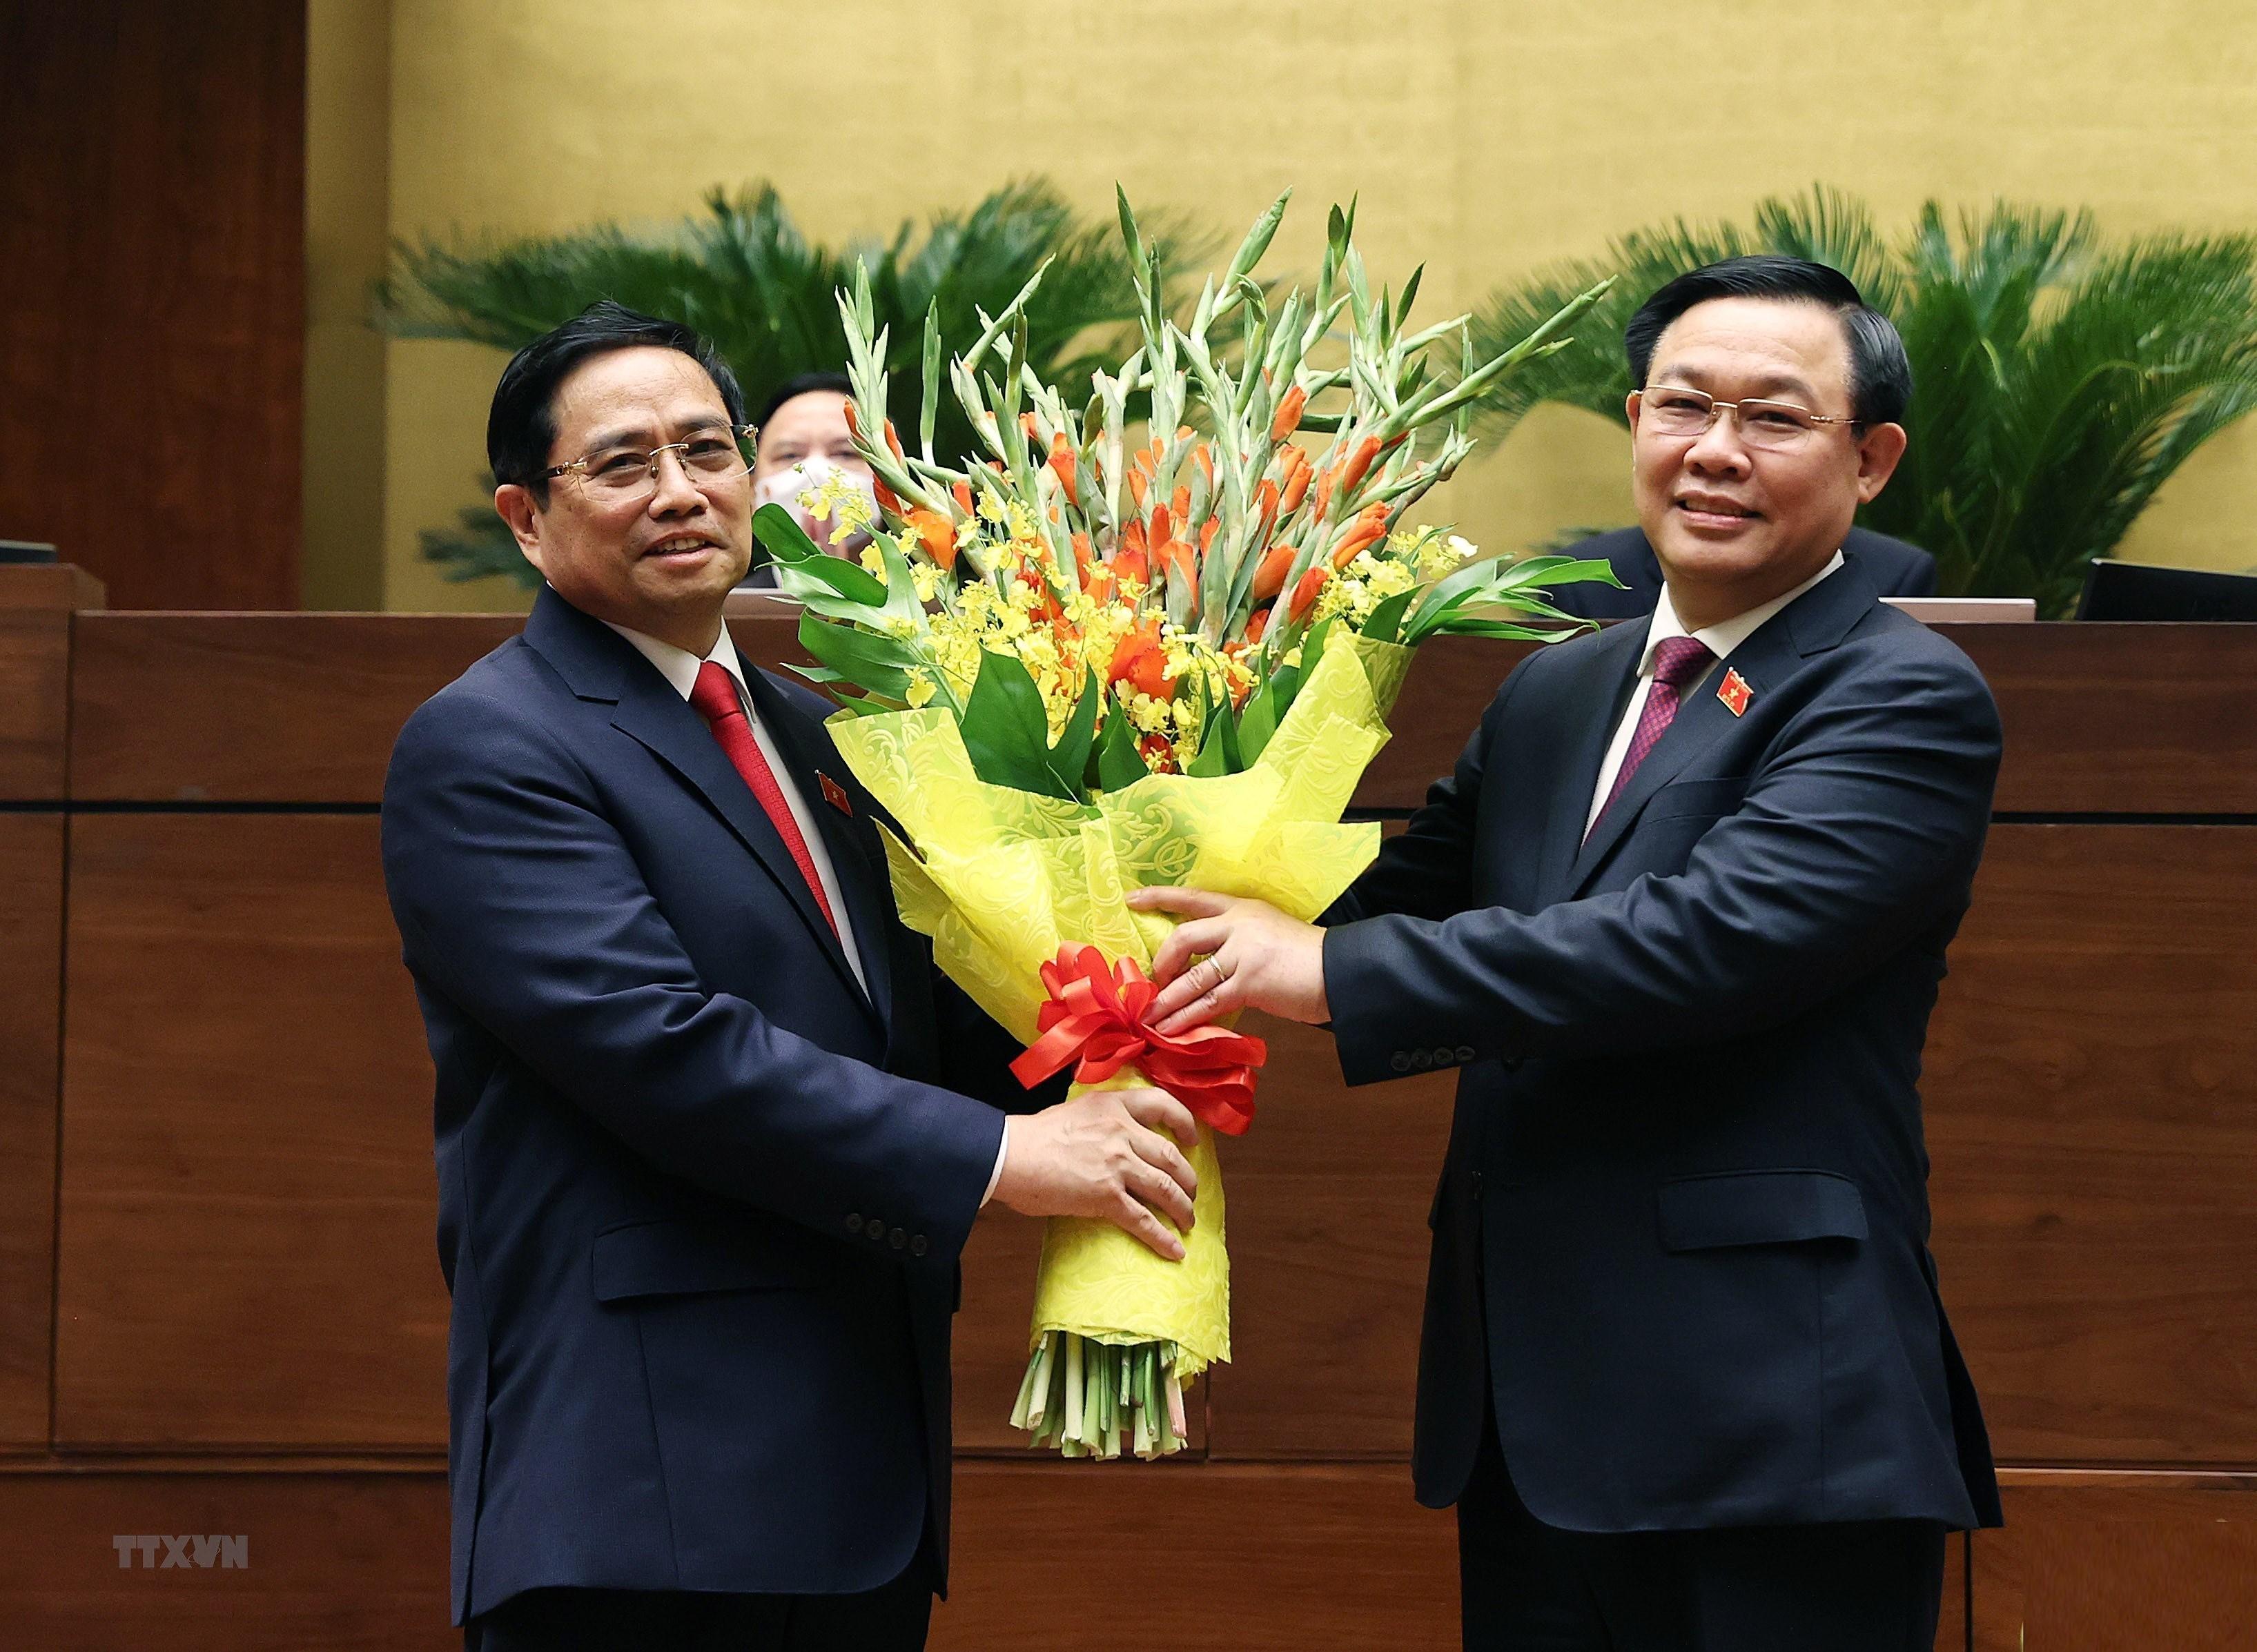 Hinh anh ong Pham Minh Chinh nham chuc Thu tuong Chinh phu hinh anh 11